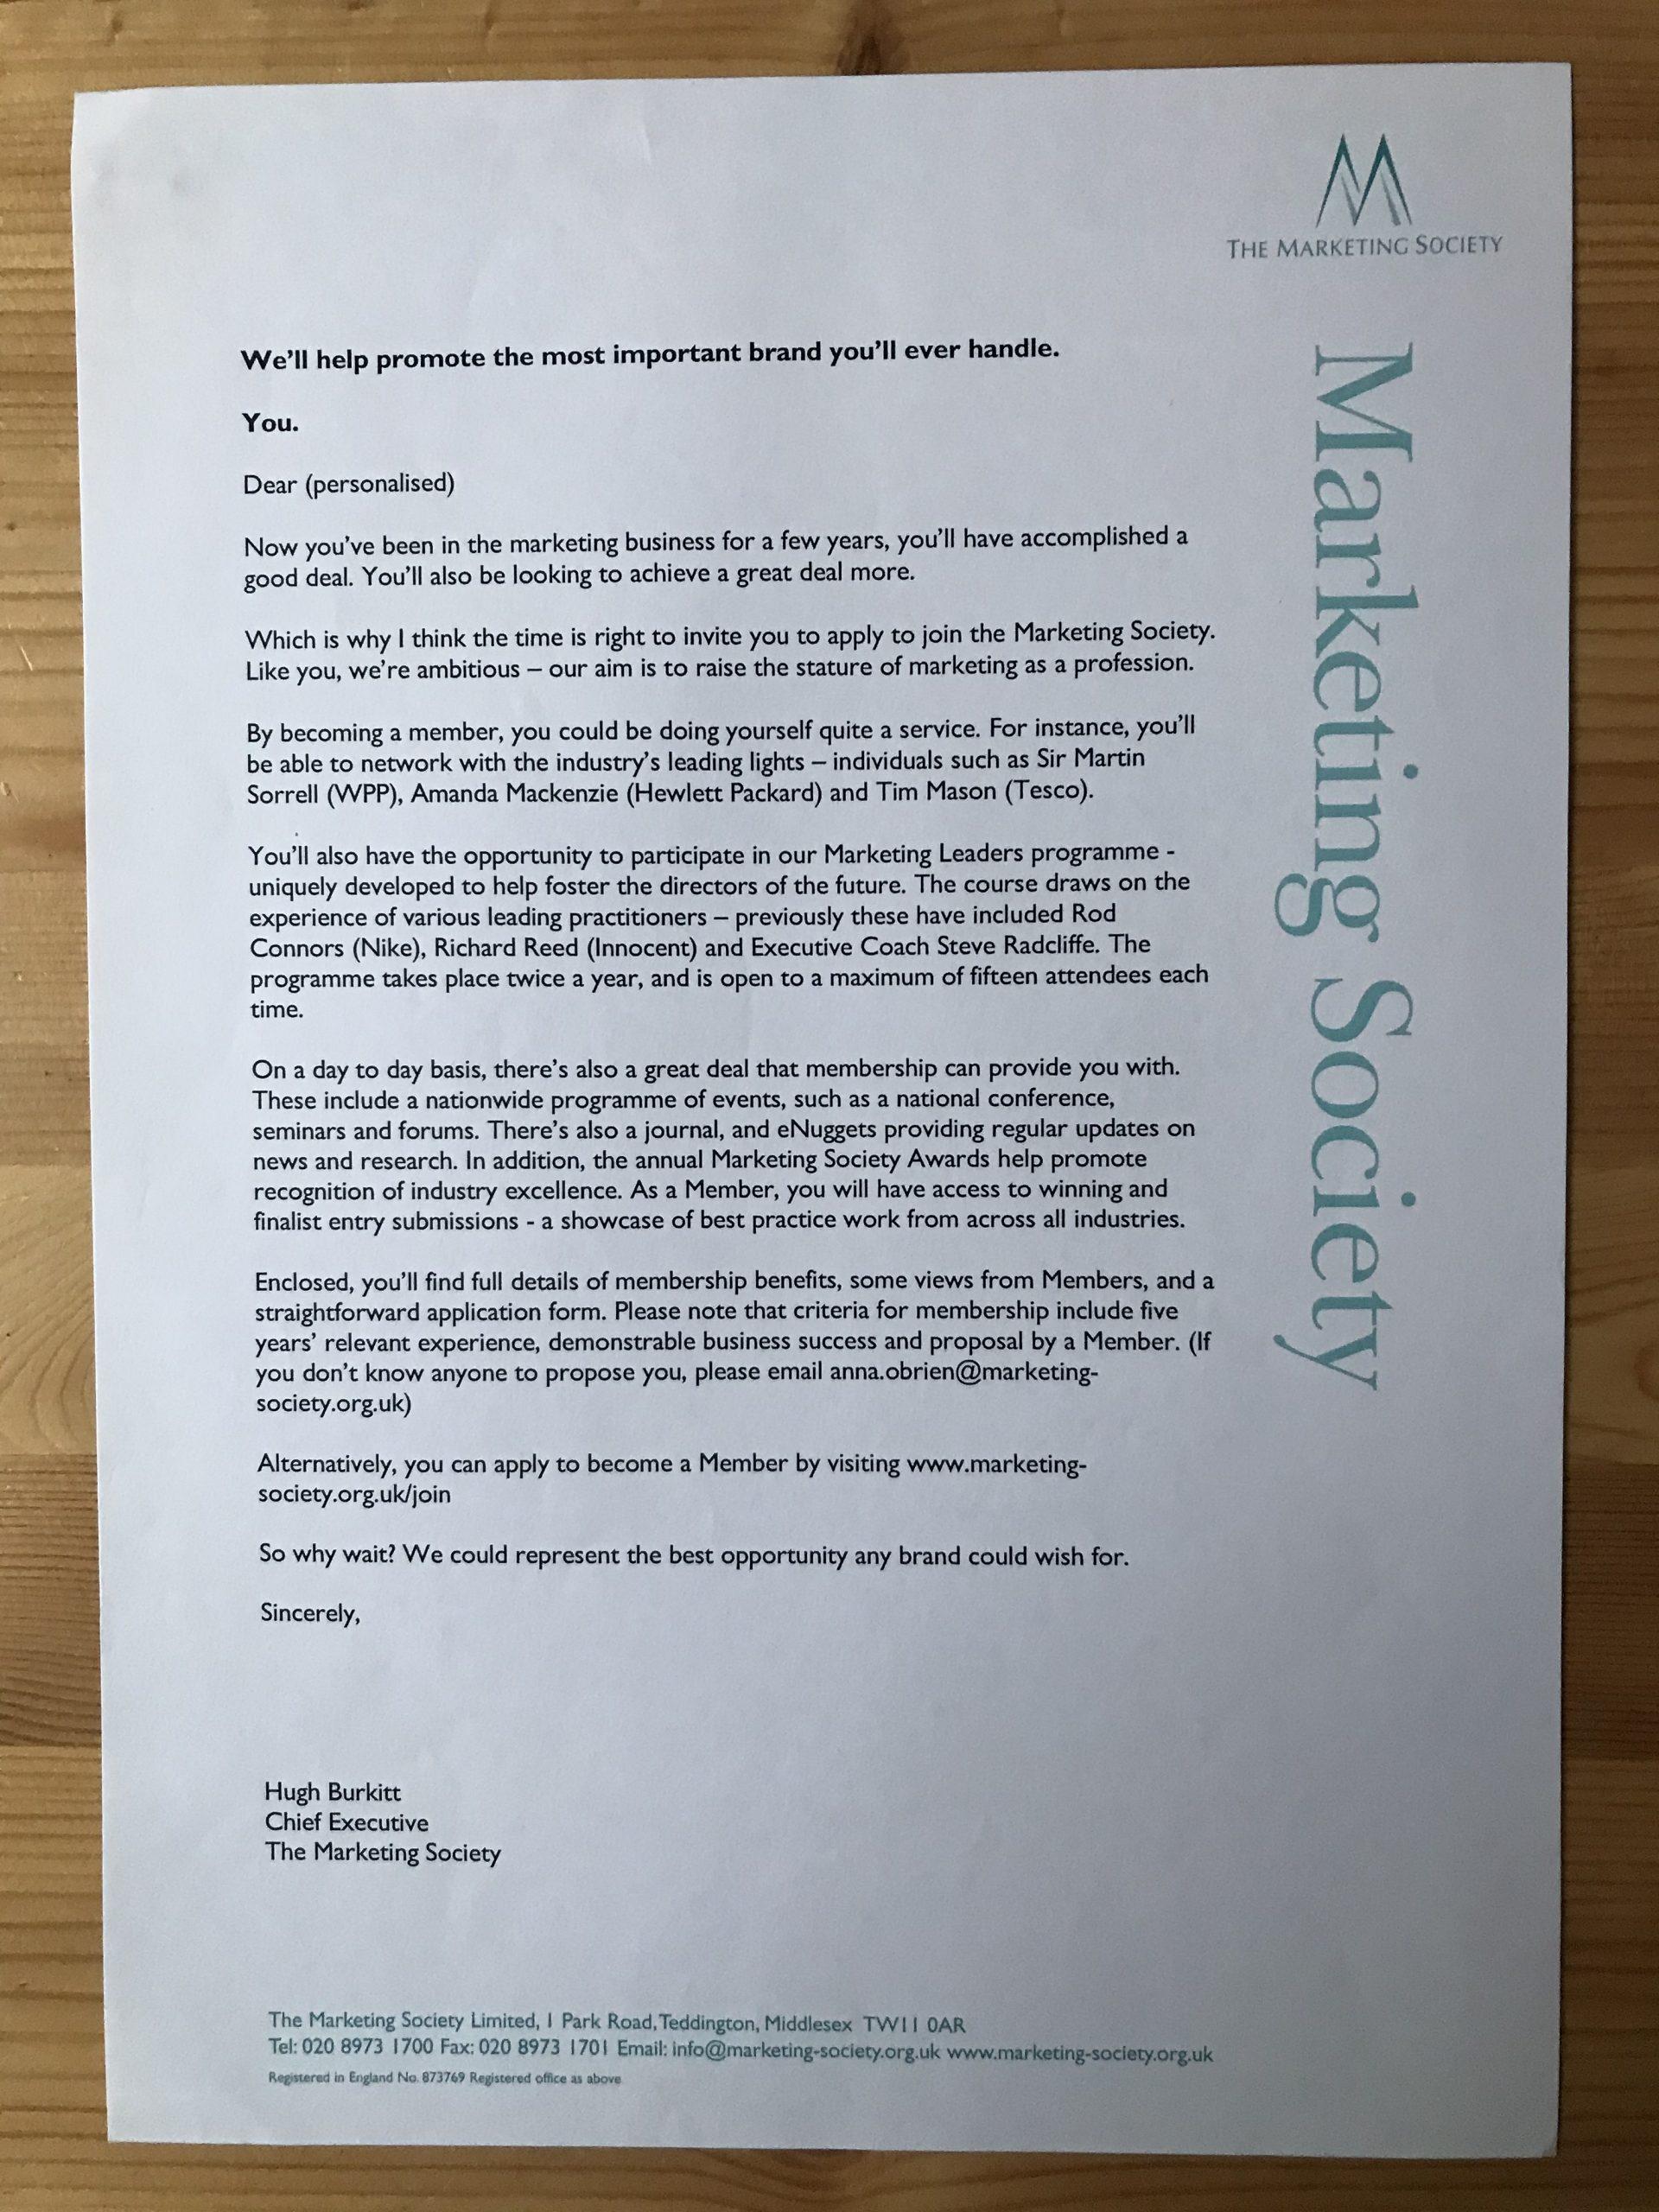 Marketing Society recruitment letter